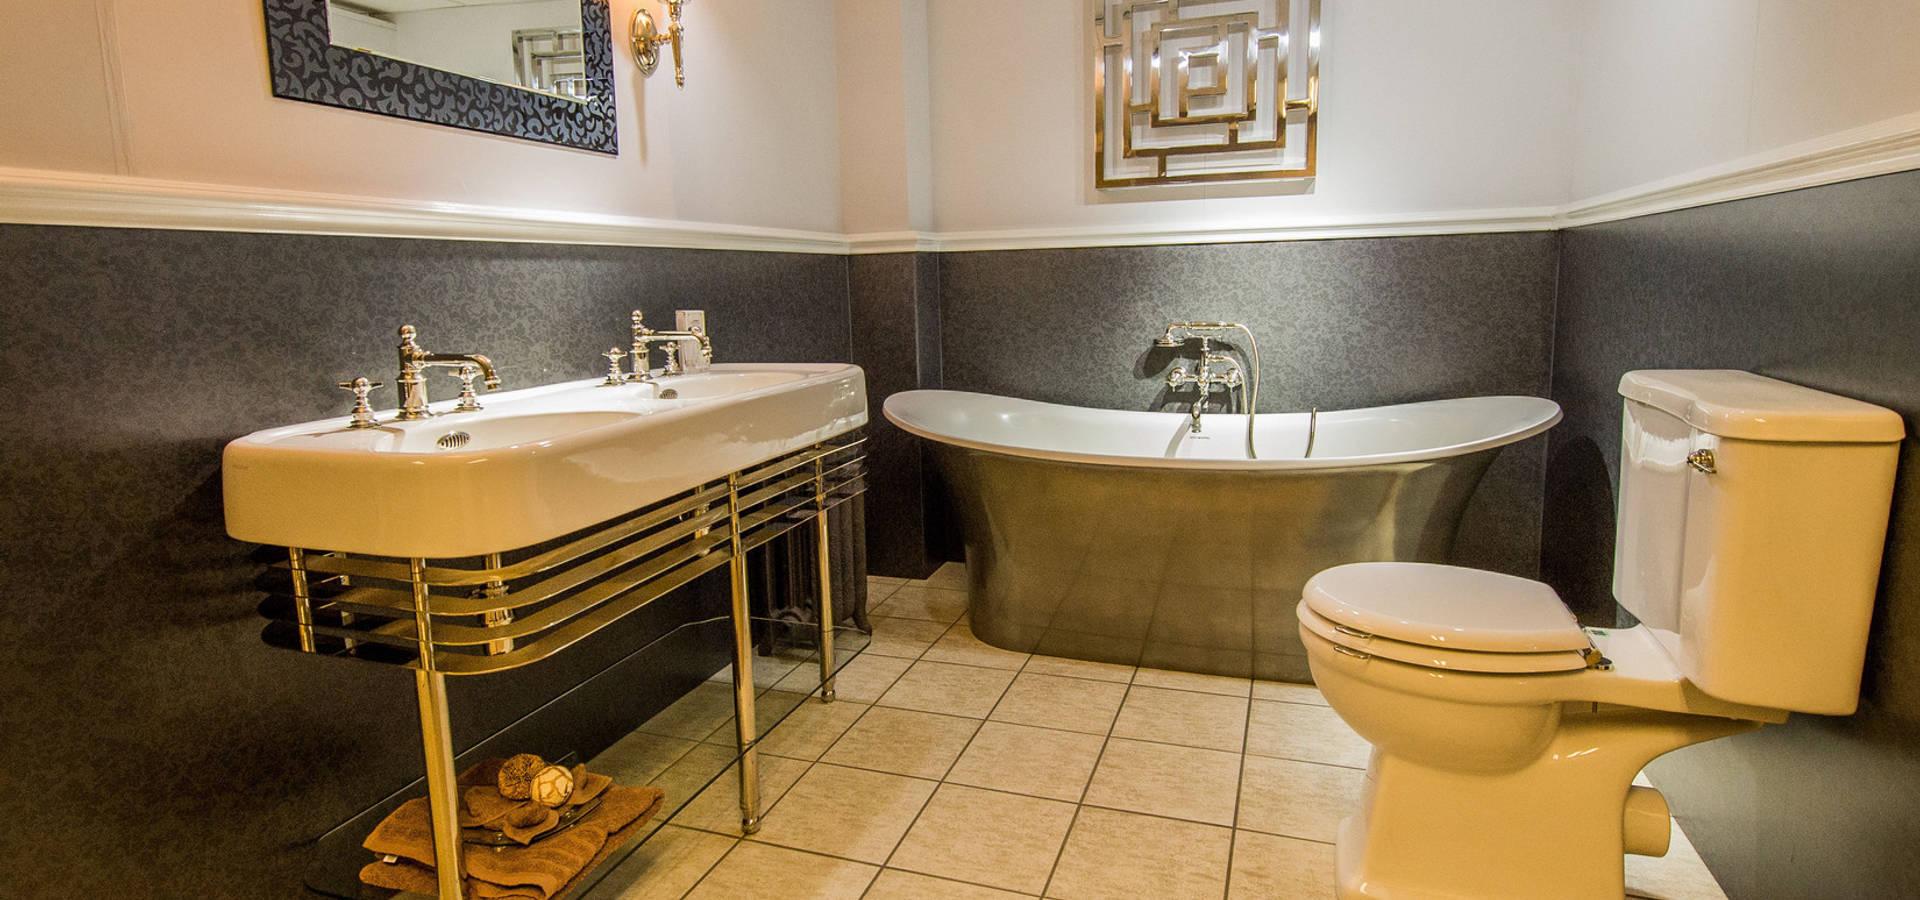 Sovereign bathroom centre